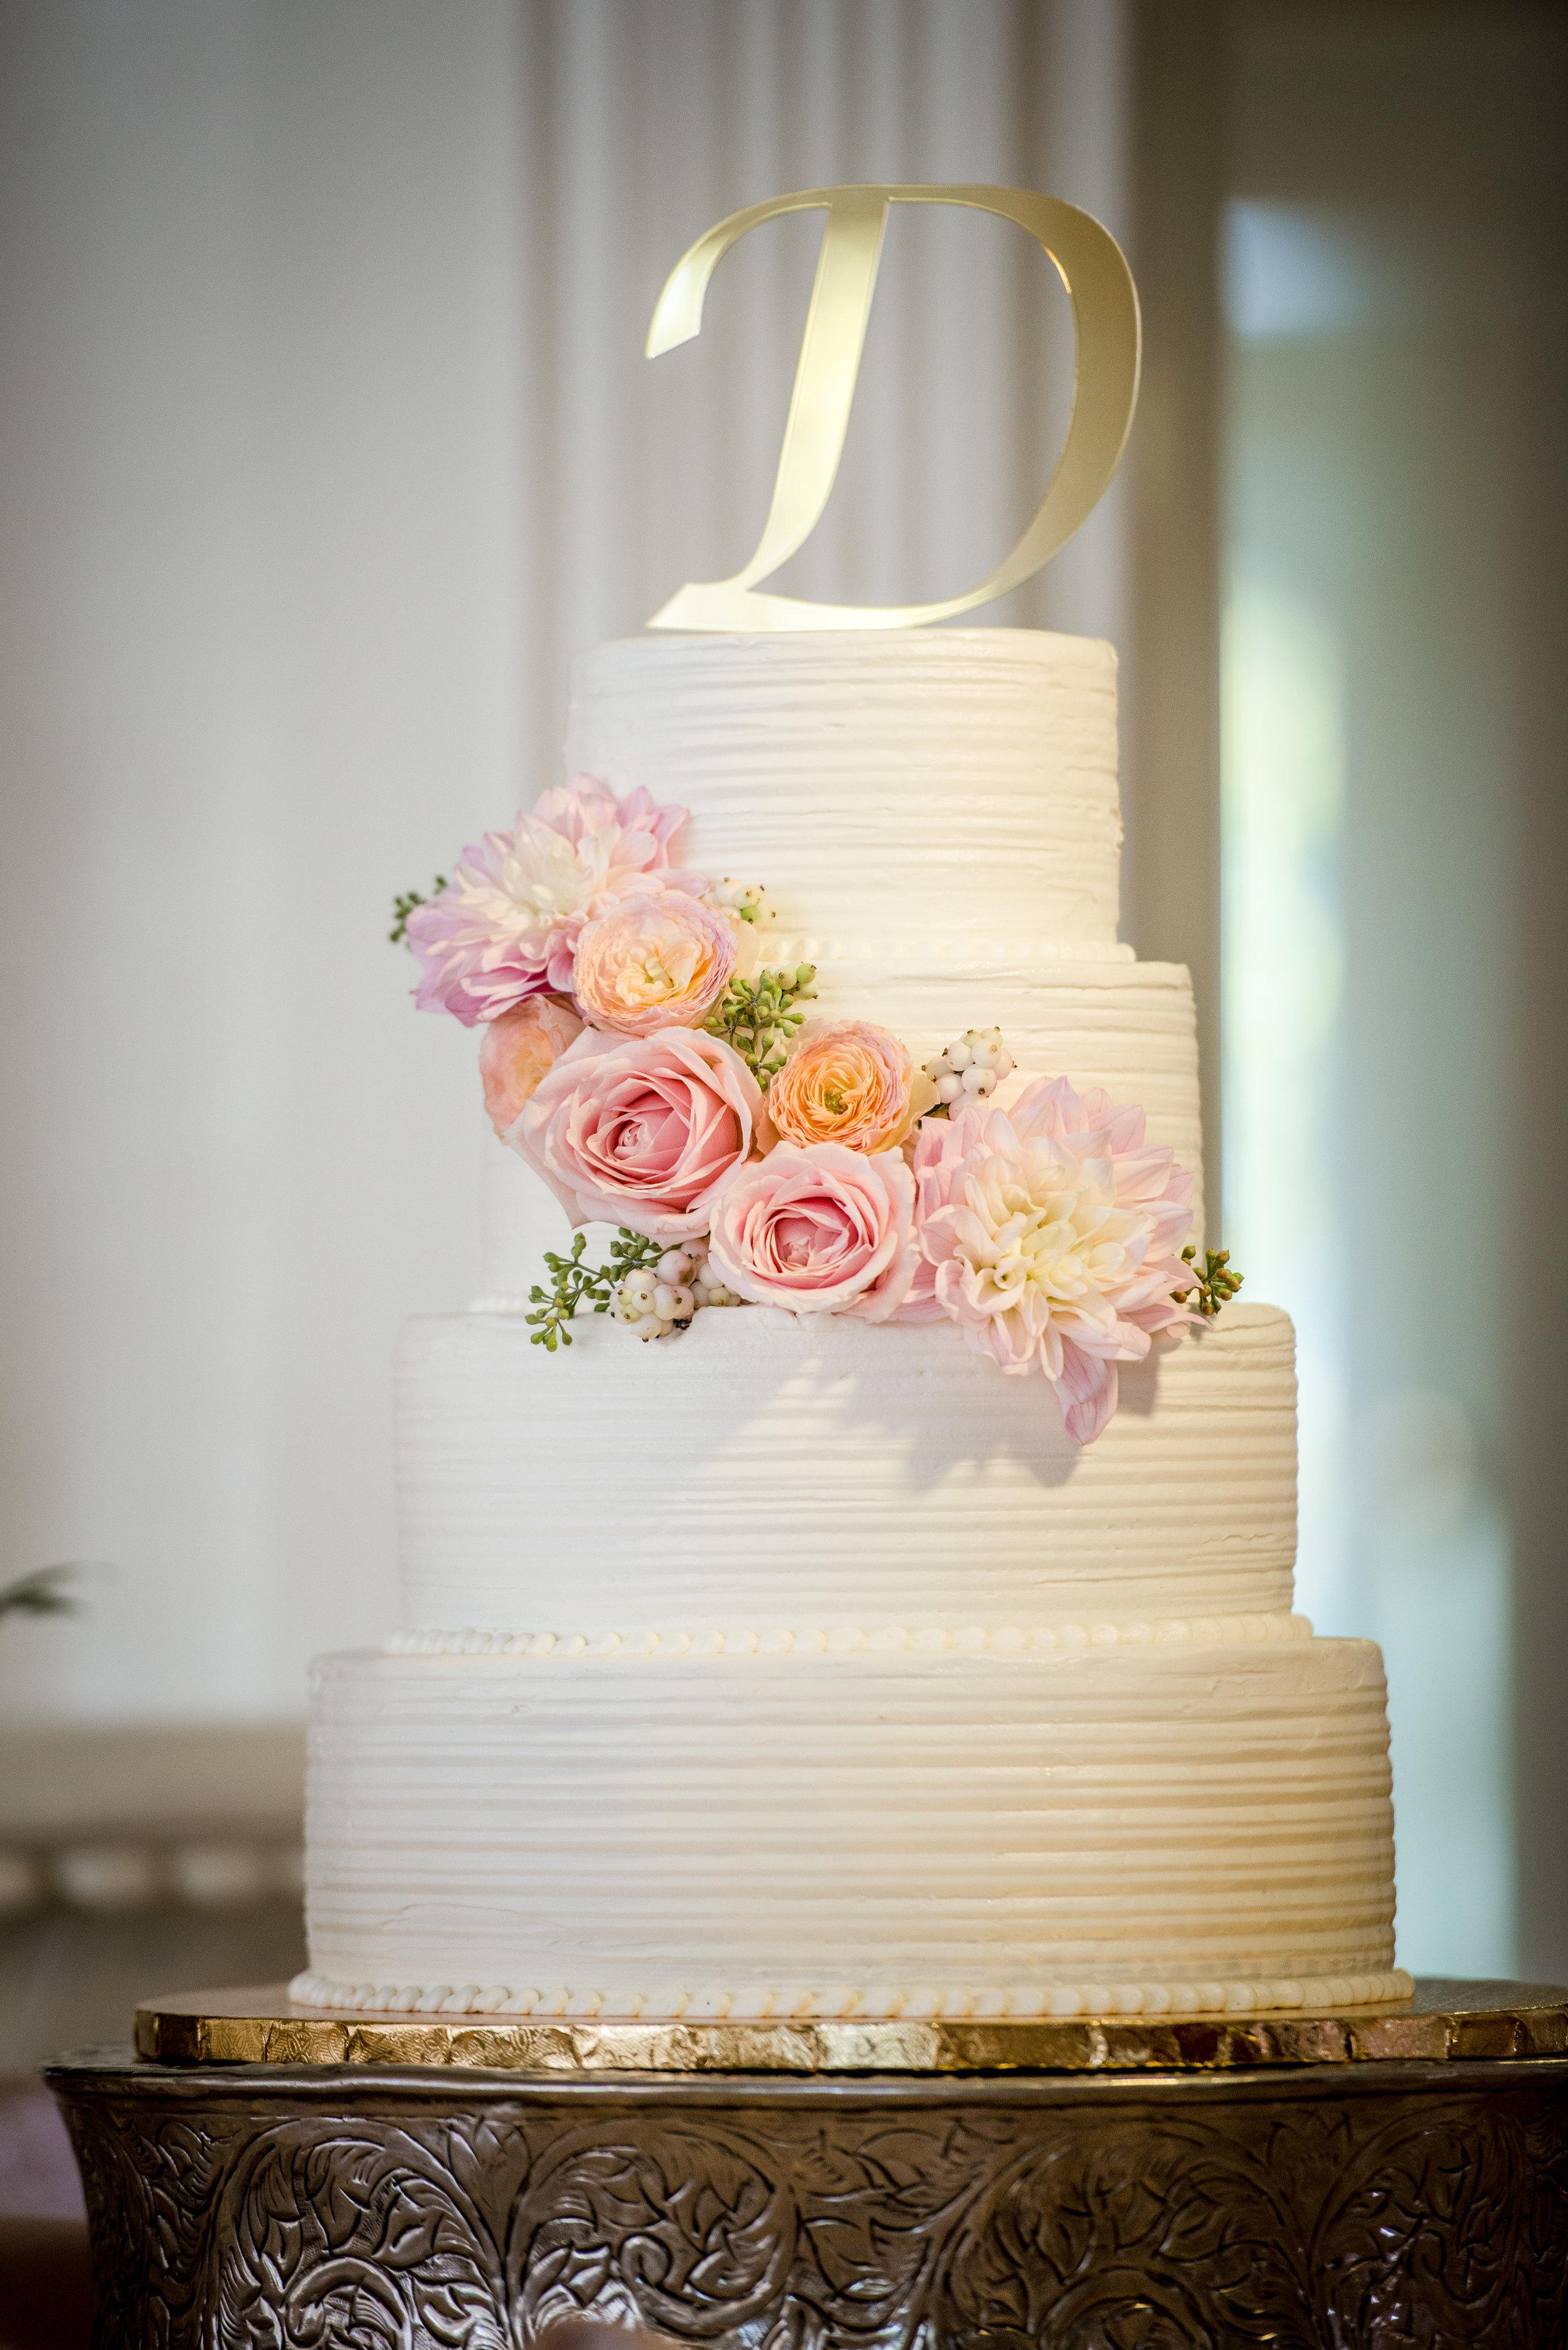 Wedding_Cake_Blush_Garden_Roses_Vizcaya_Sacramento_Violette_Fleurs.jpg